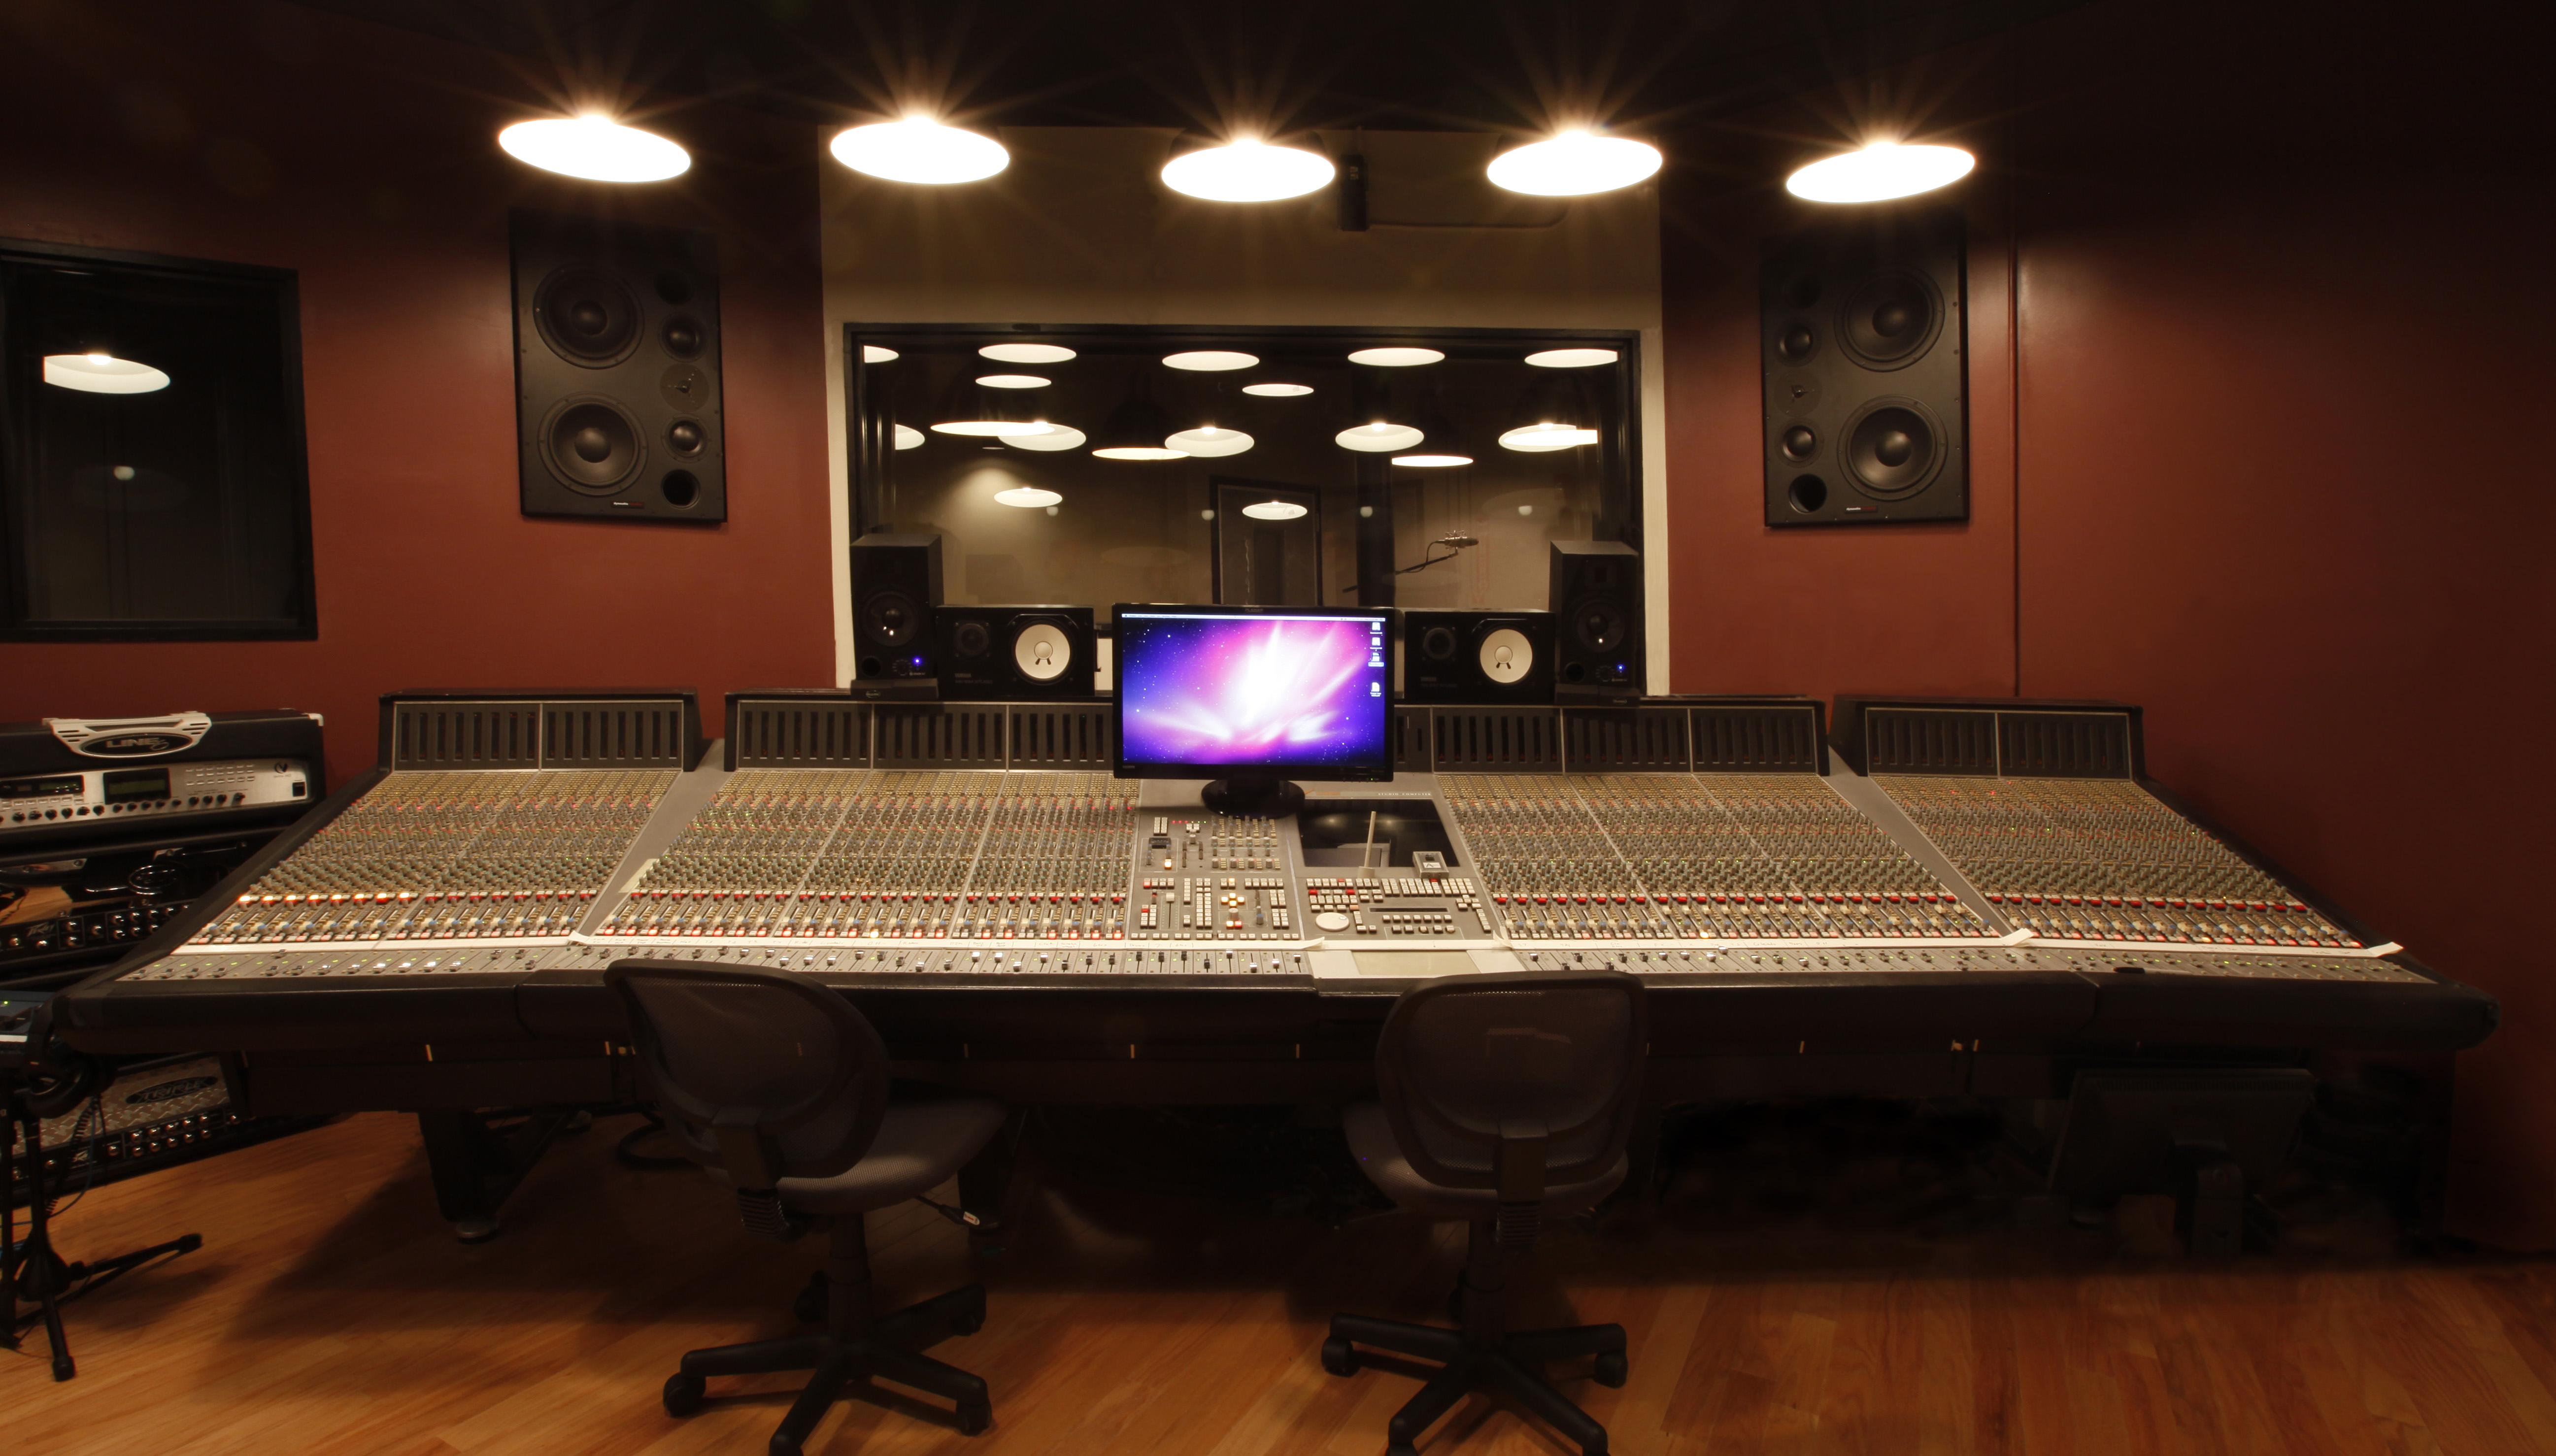 Strange Music Studio Wallpaper Wallpapersafari Largest Home Design Picture Inspirations Pitcheantrous